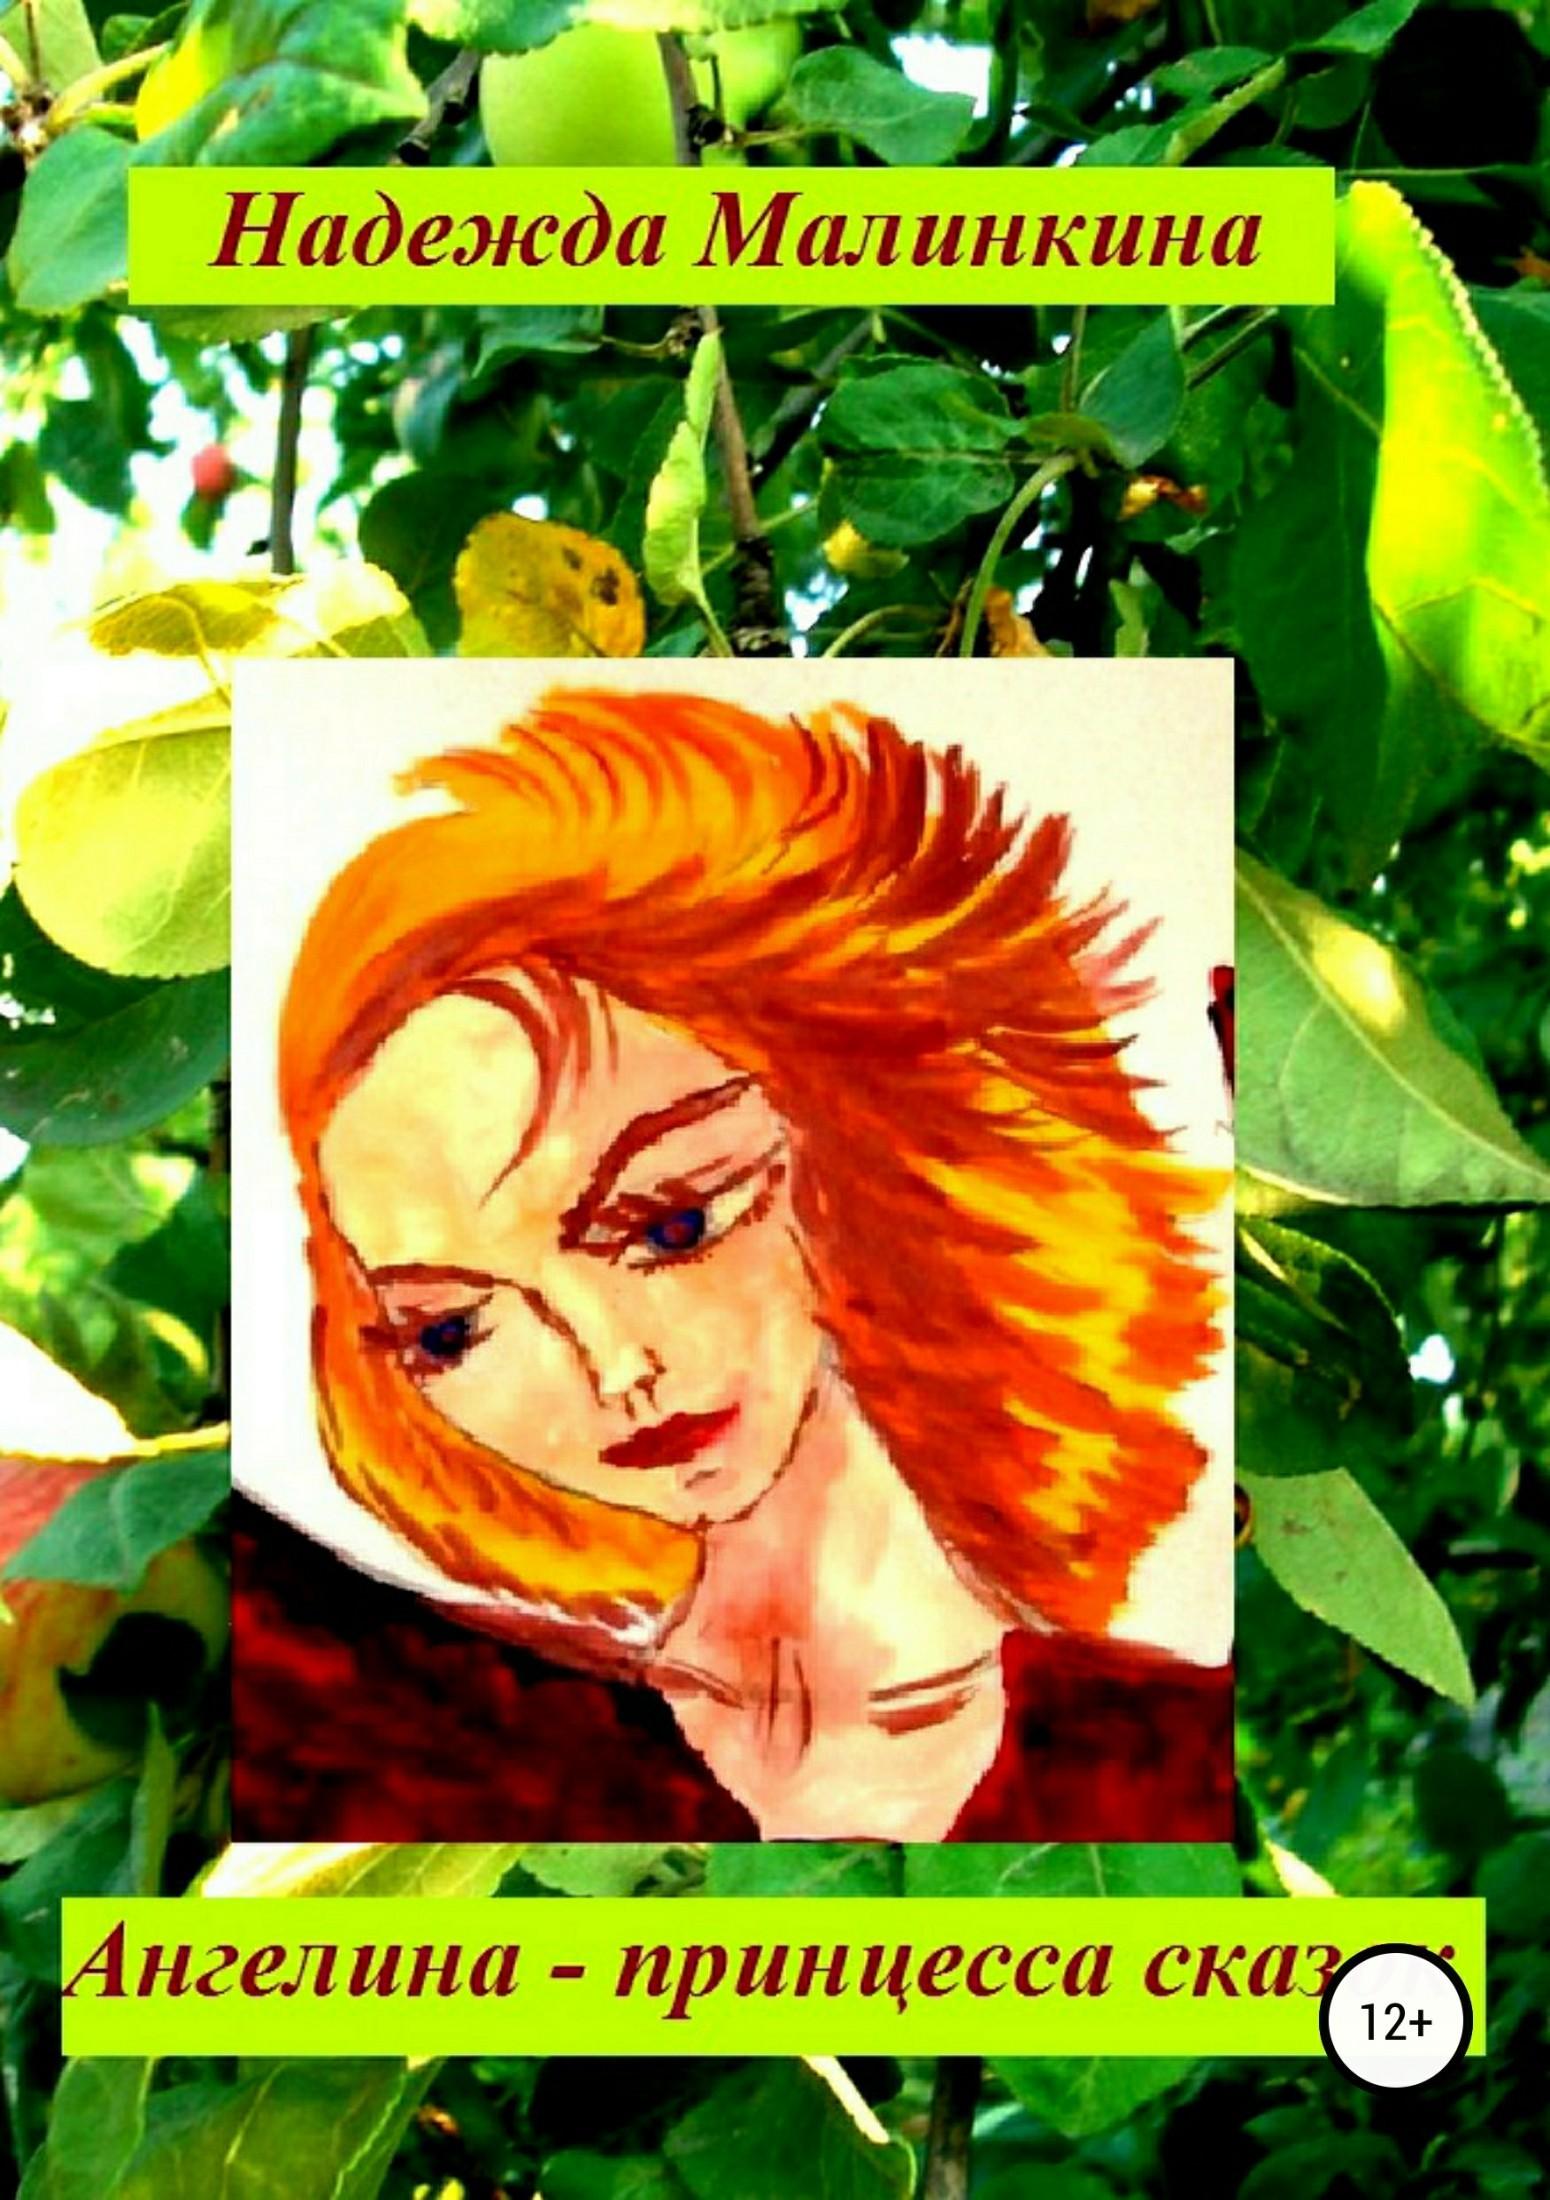 Ангелина – принцесса сказок